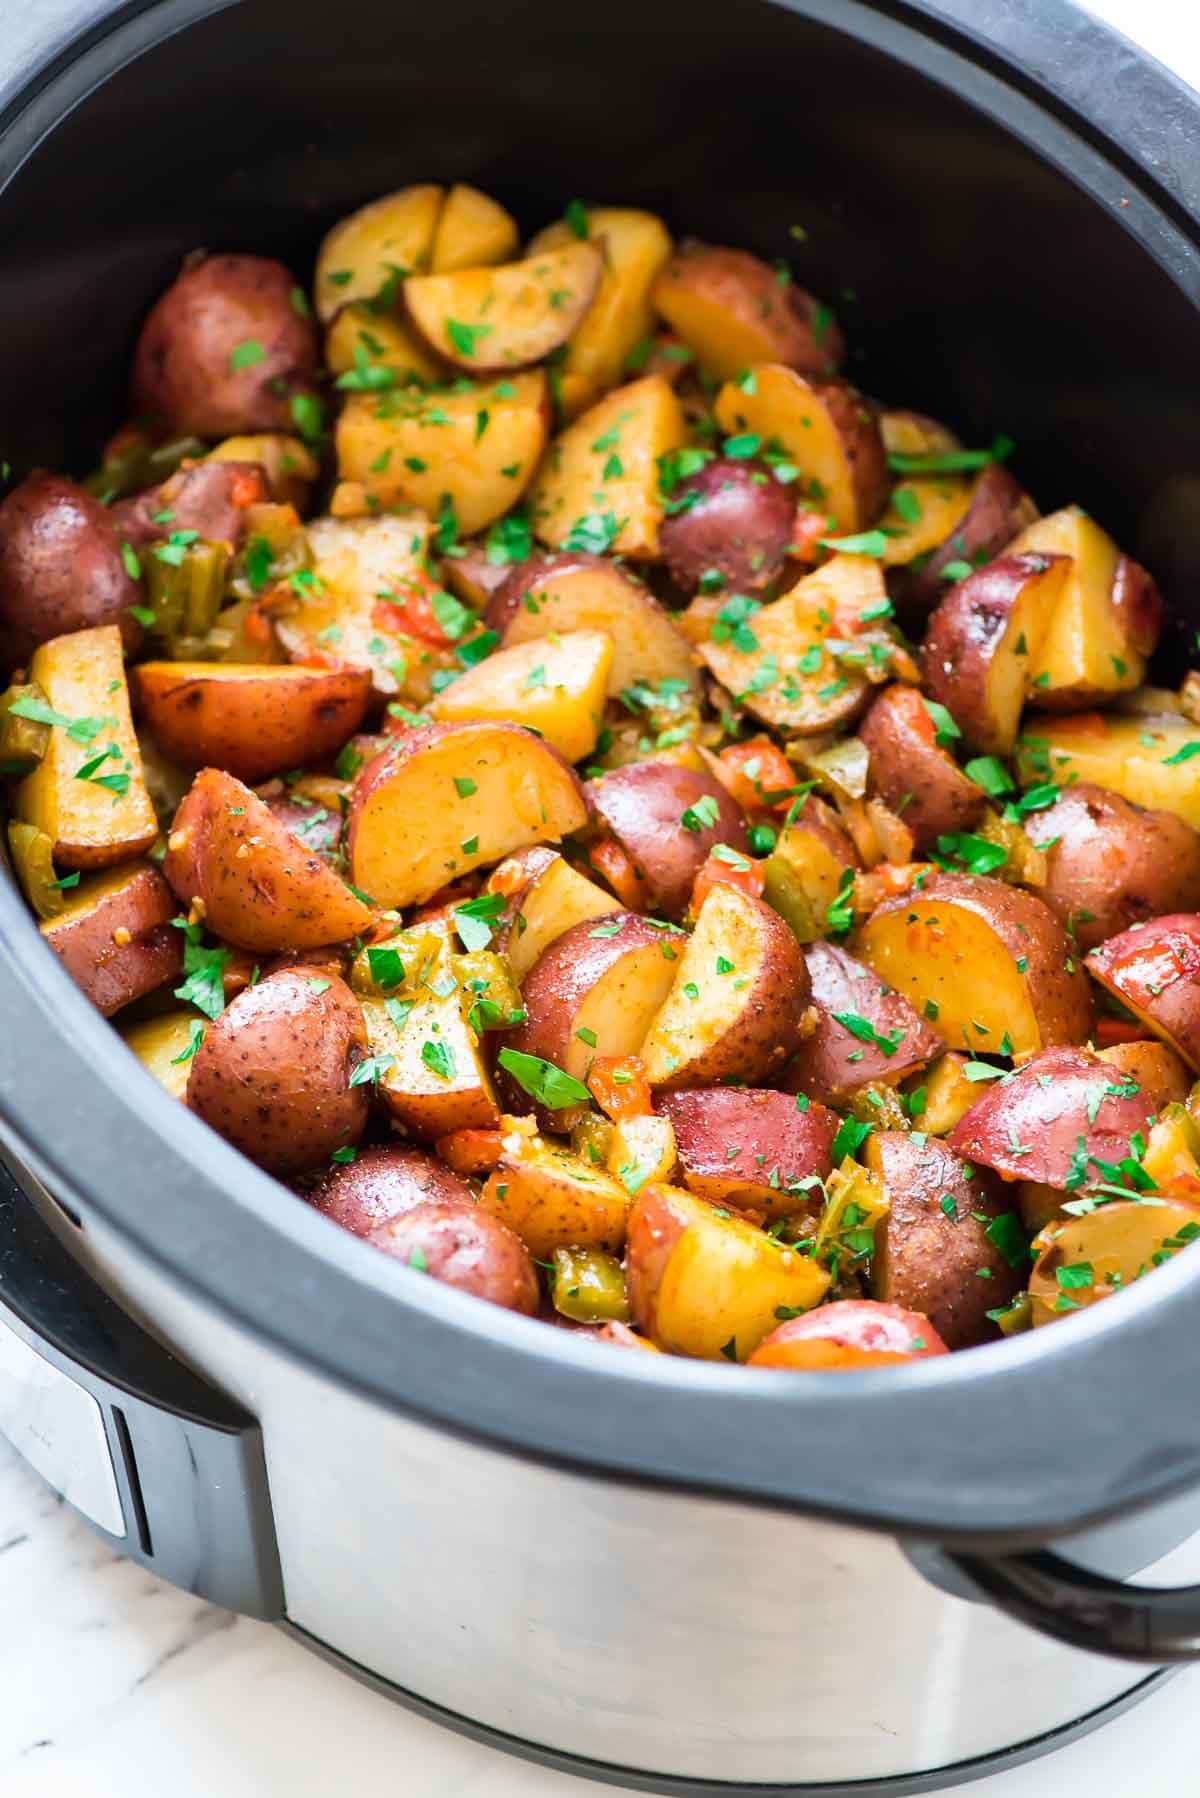 Crockpot Breakfast Potatoes from wellplated.com on foodiecrush.com